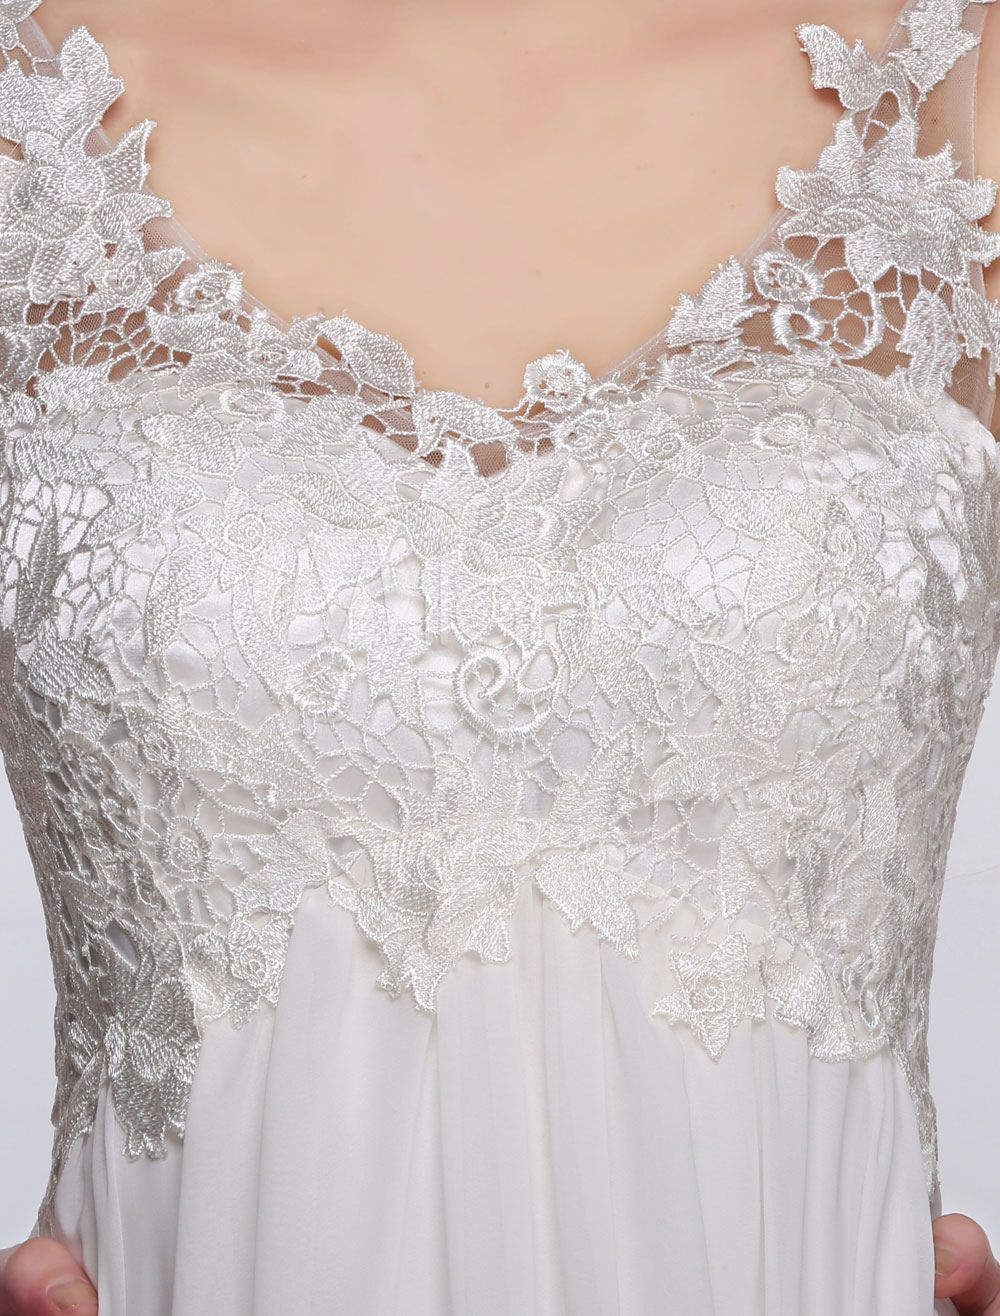 07bf5d6ad838 Short Wedding Dress White Lace Chiffon Sweetheart Summer Wedding Dresses  2018 High Waist Knee Length Bridal